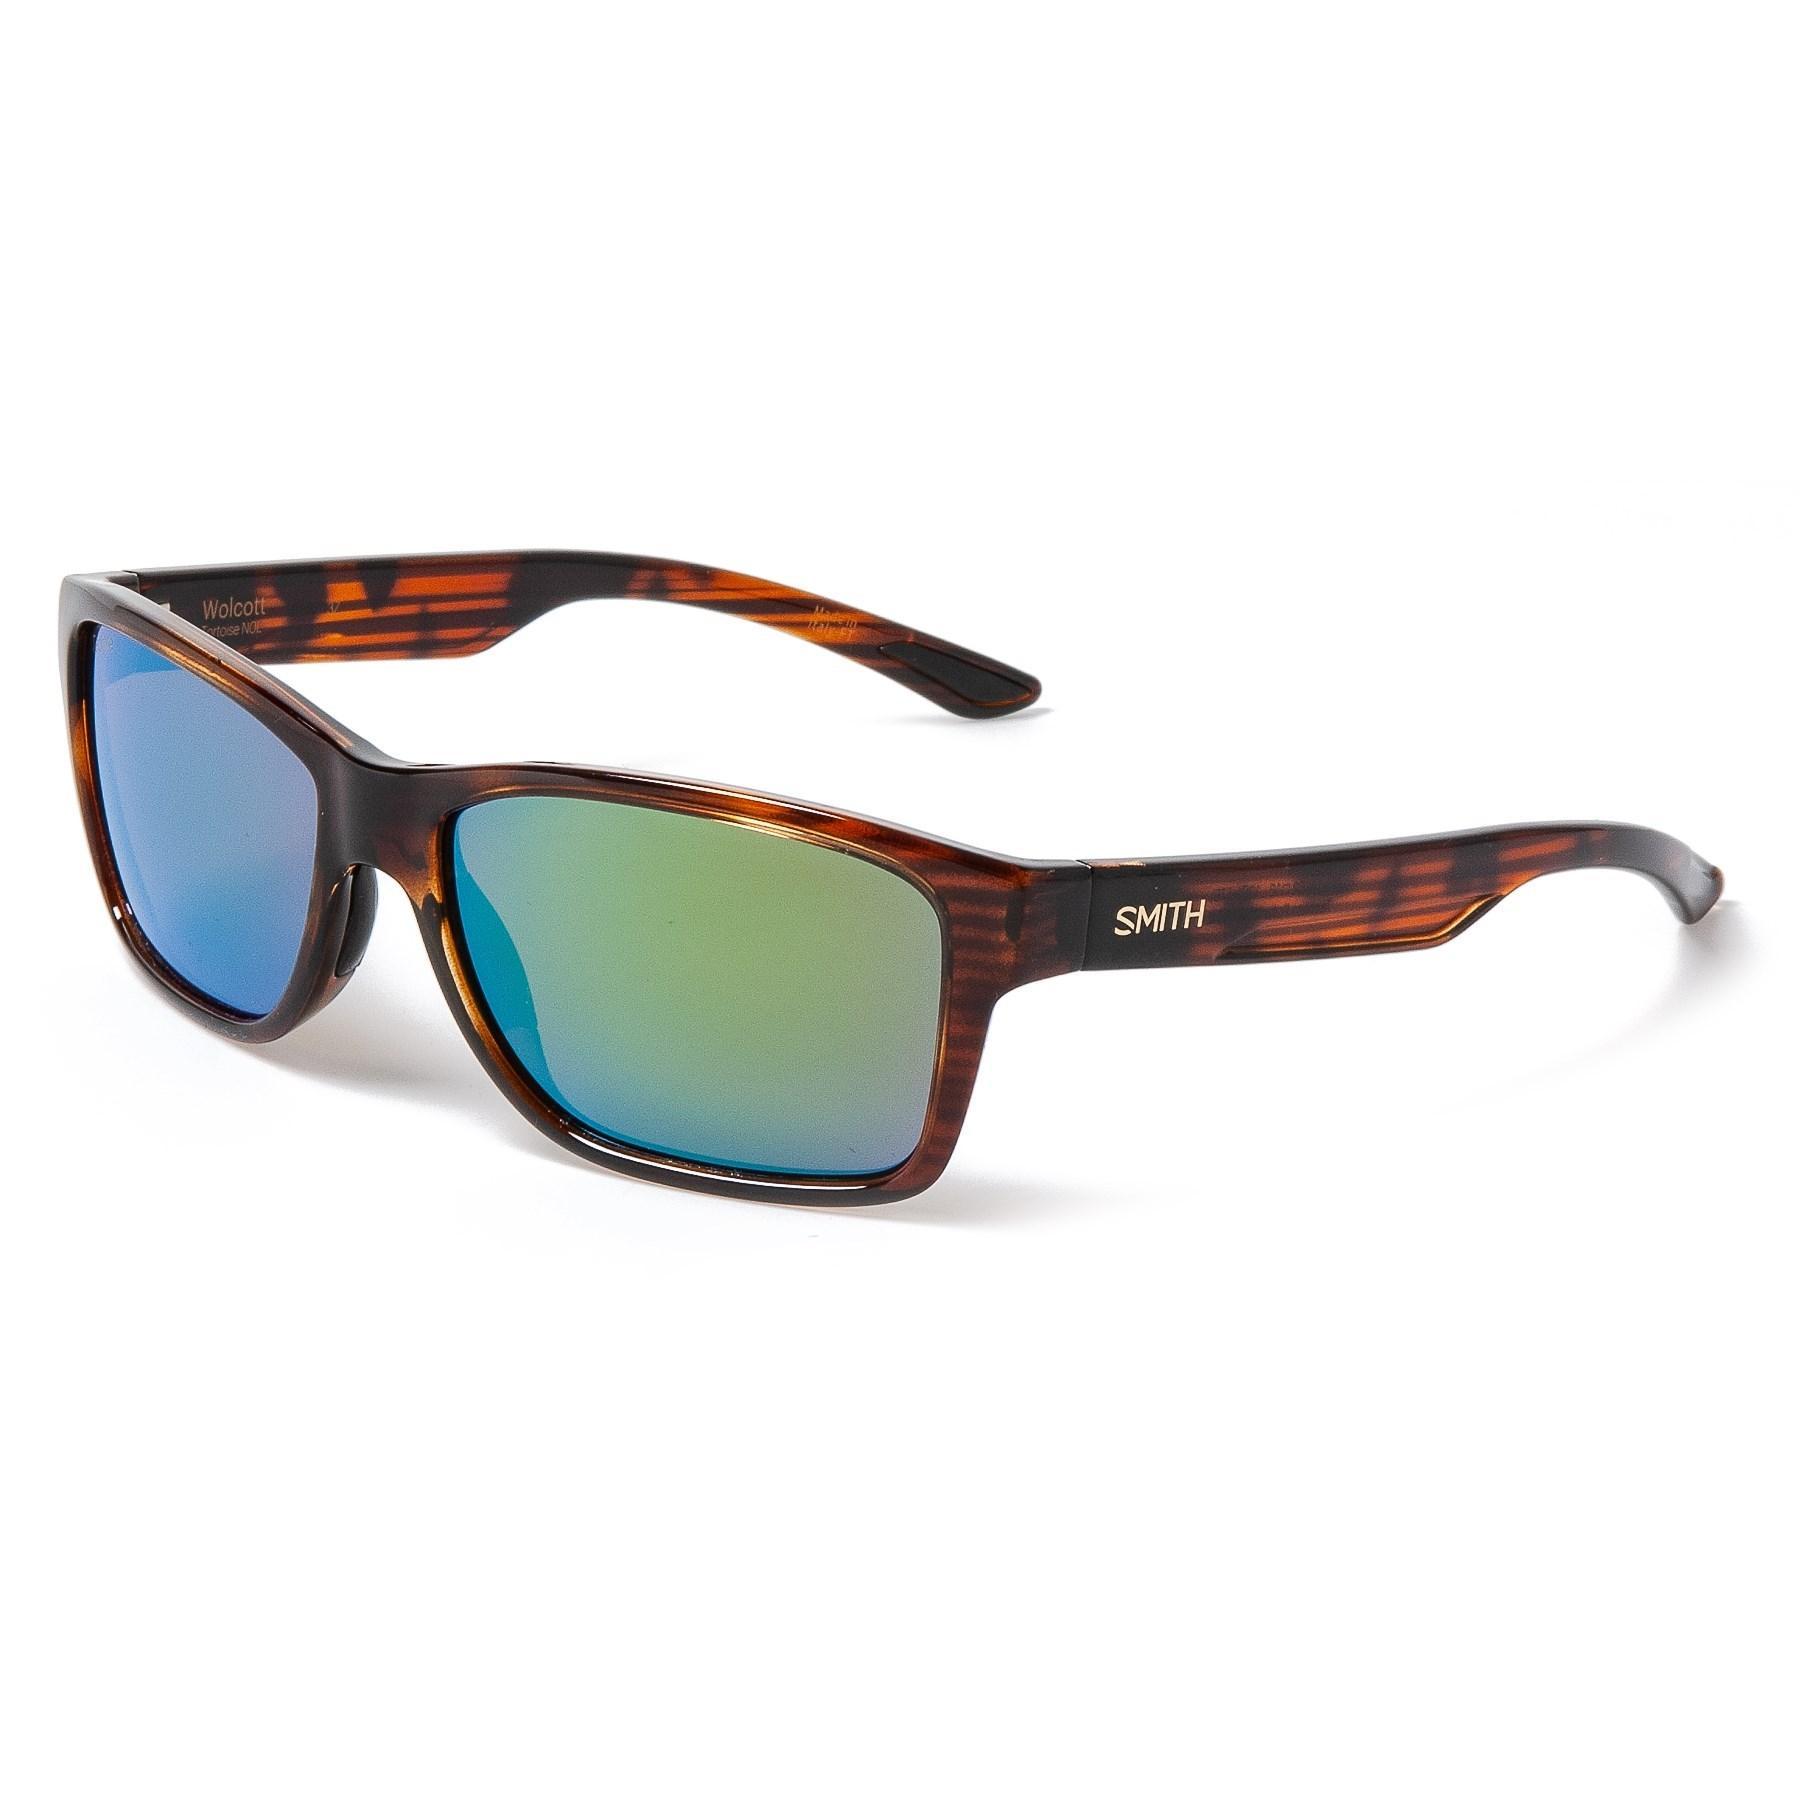 df1707d95e60 Lyst - Smith Optics Wolcott Sunglasses in Green for Men